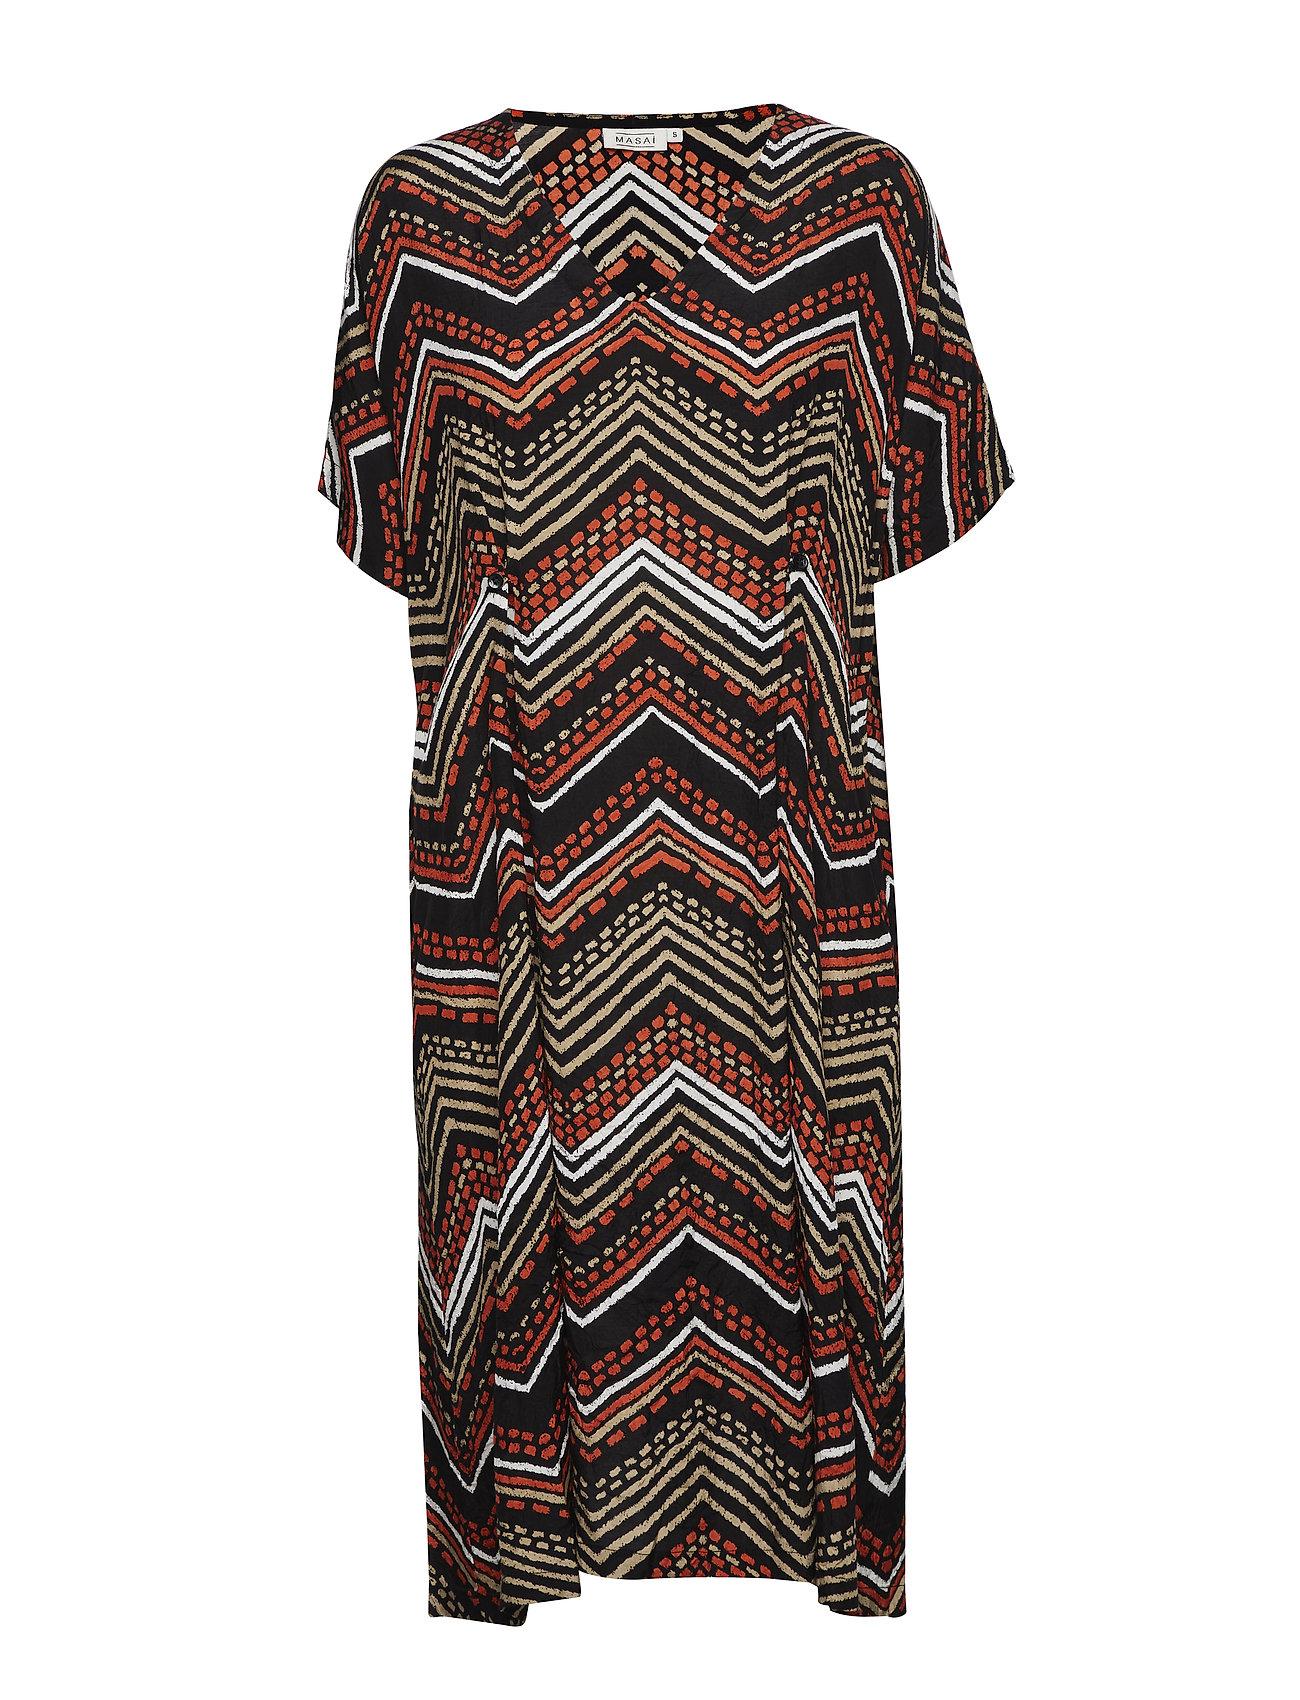 Masai Nibia dress - FLAME ORG